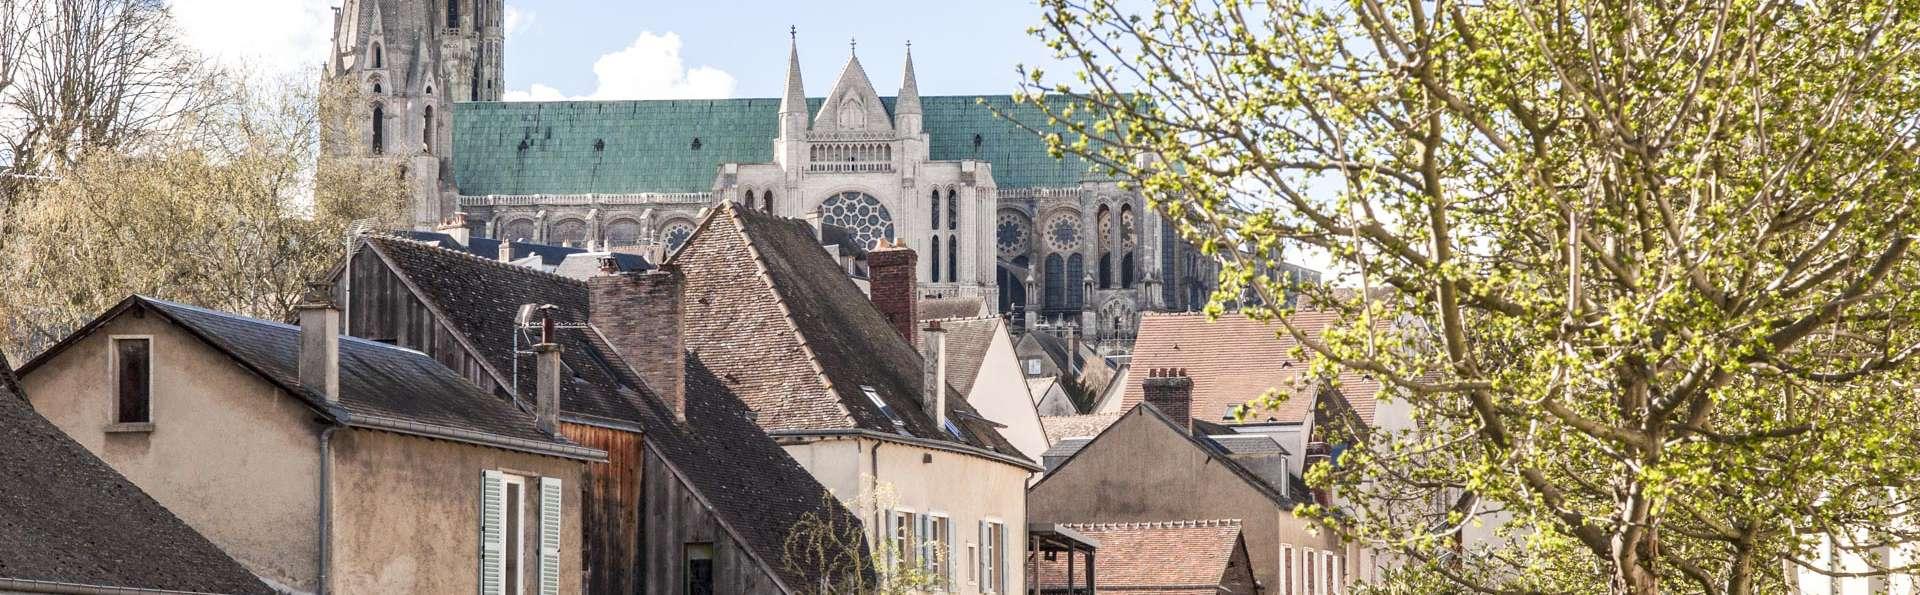 Novotel Chartres - EDIT_DESTINATION_04.jpg